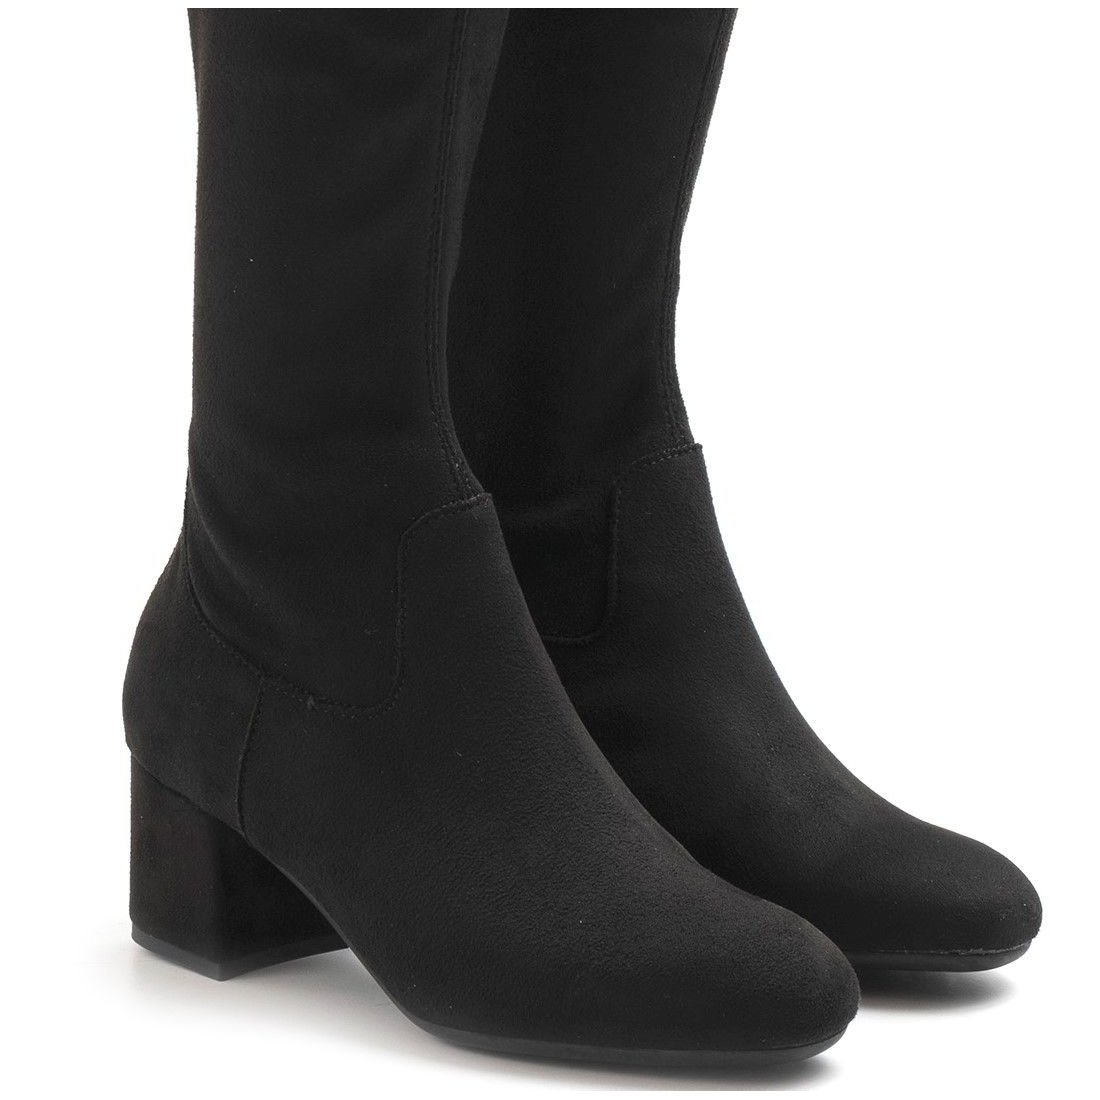 boots woman sangiorgio quesannaroyal nero 7806